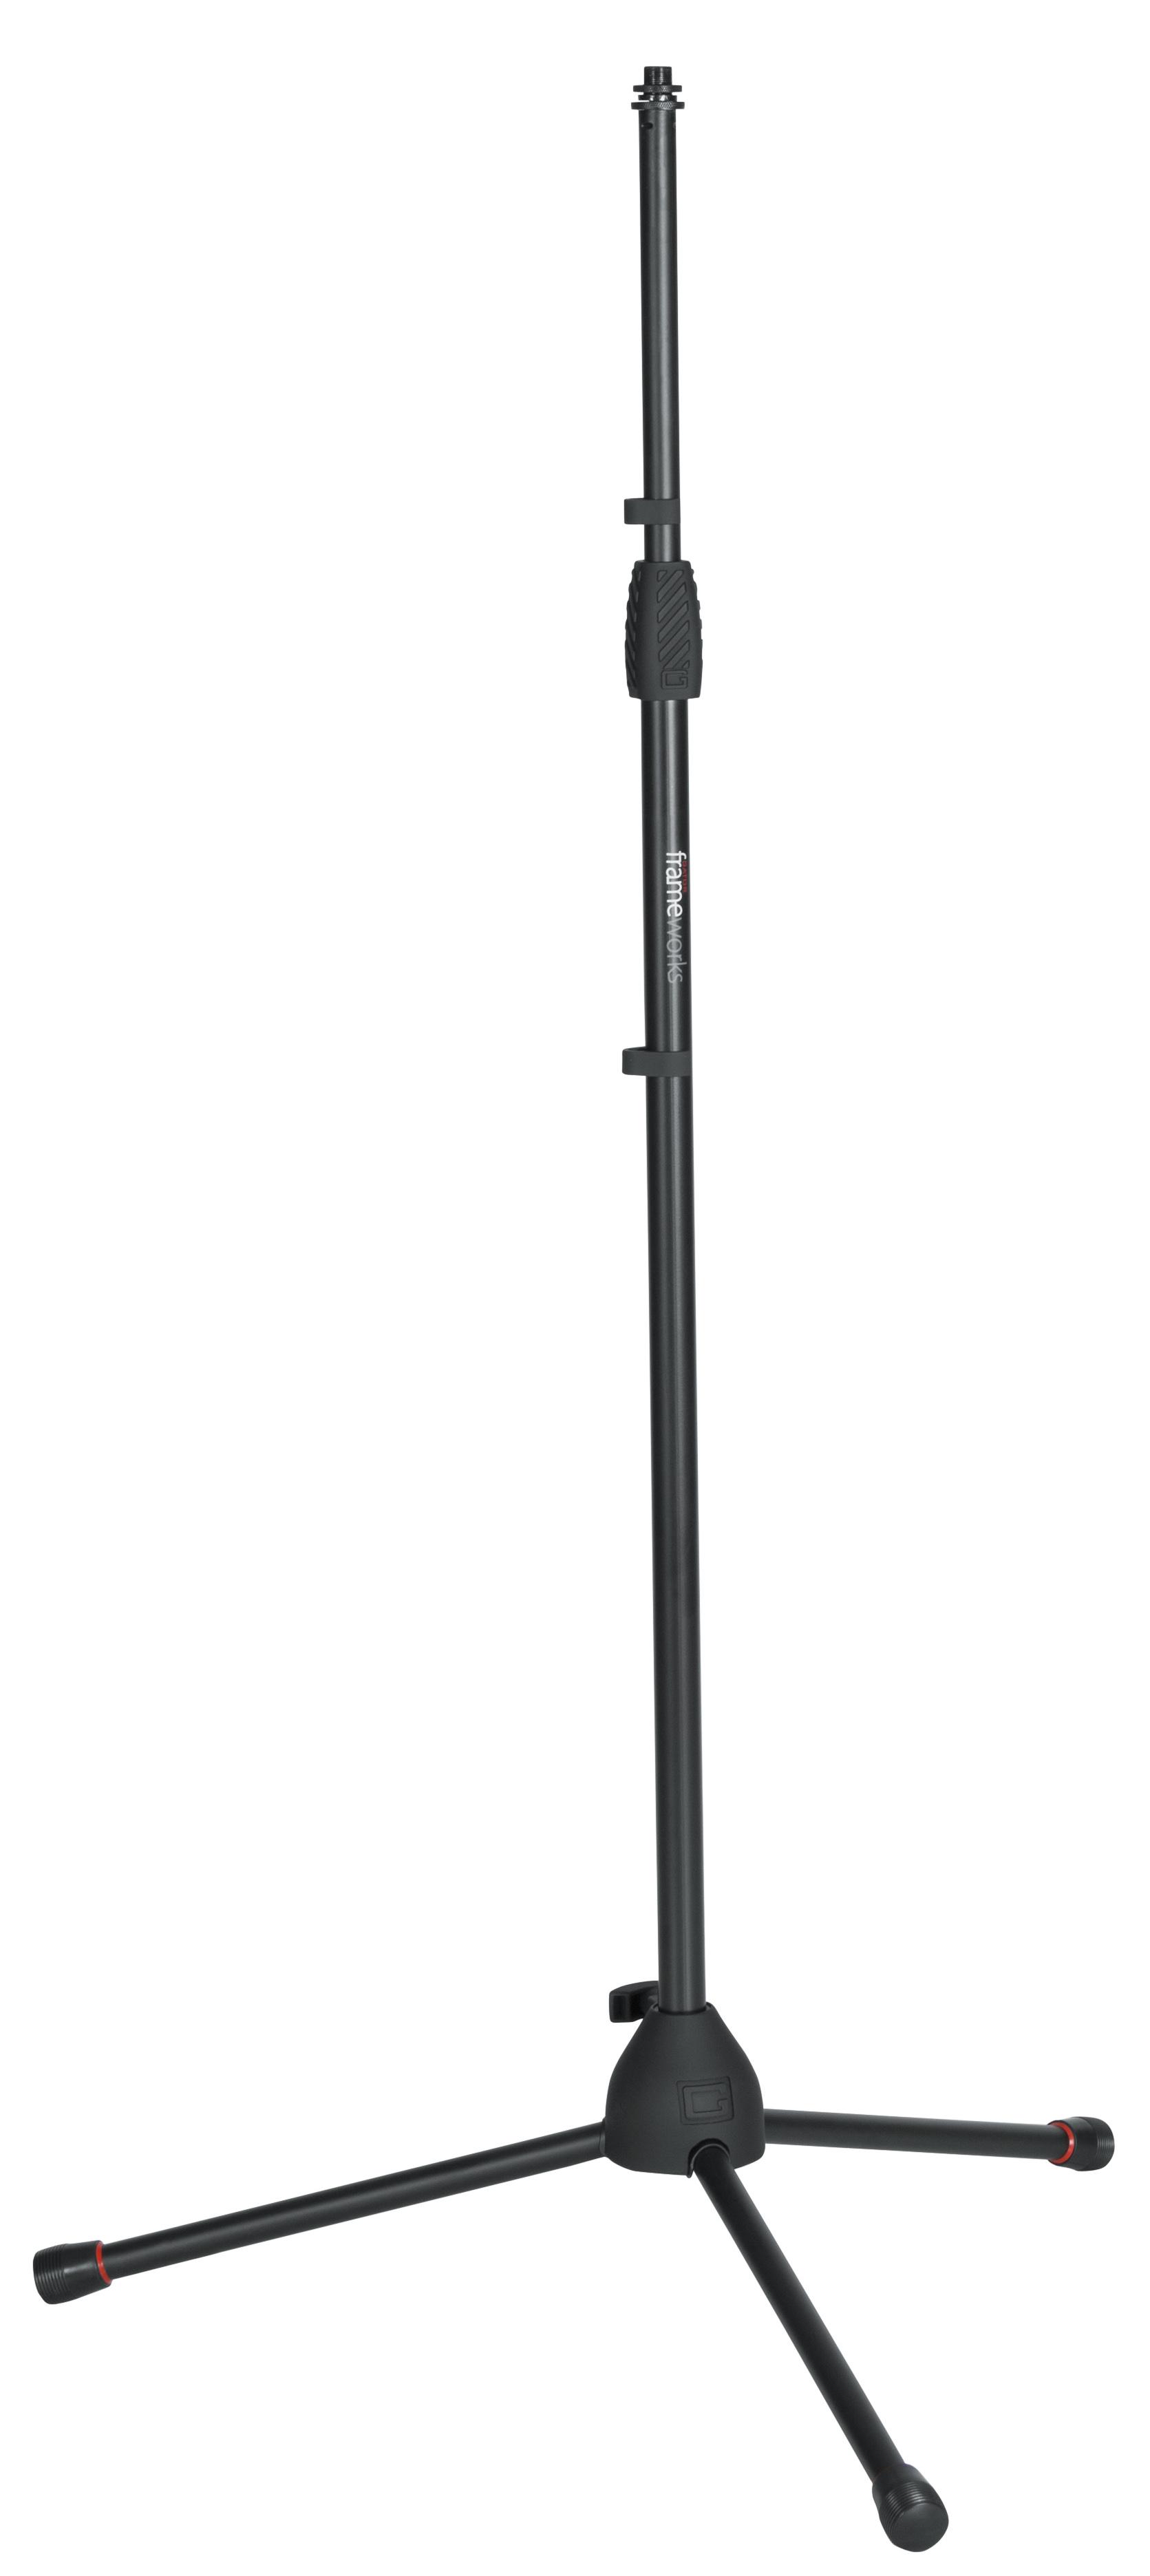 Gator Frameworks GFW-MIC-2000 Standard Tripod Mic Stand